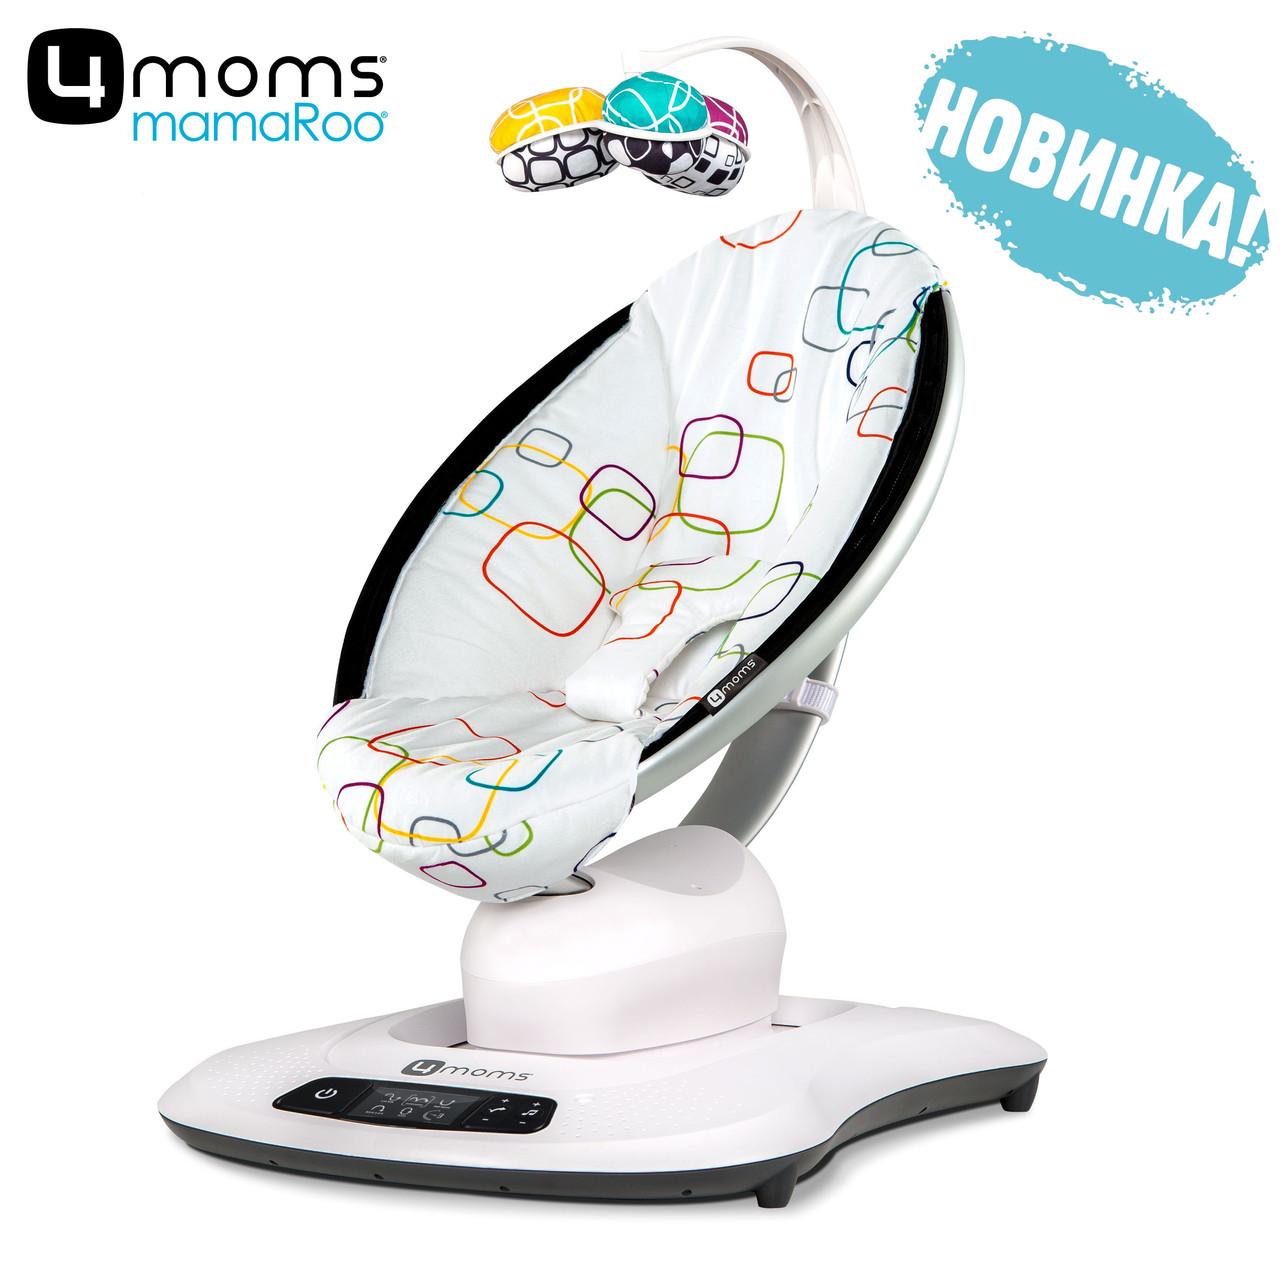 Крісло-гойдалка 4moms MamaRoo 4.0